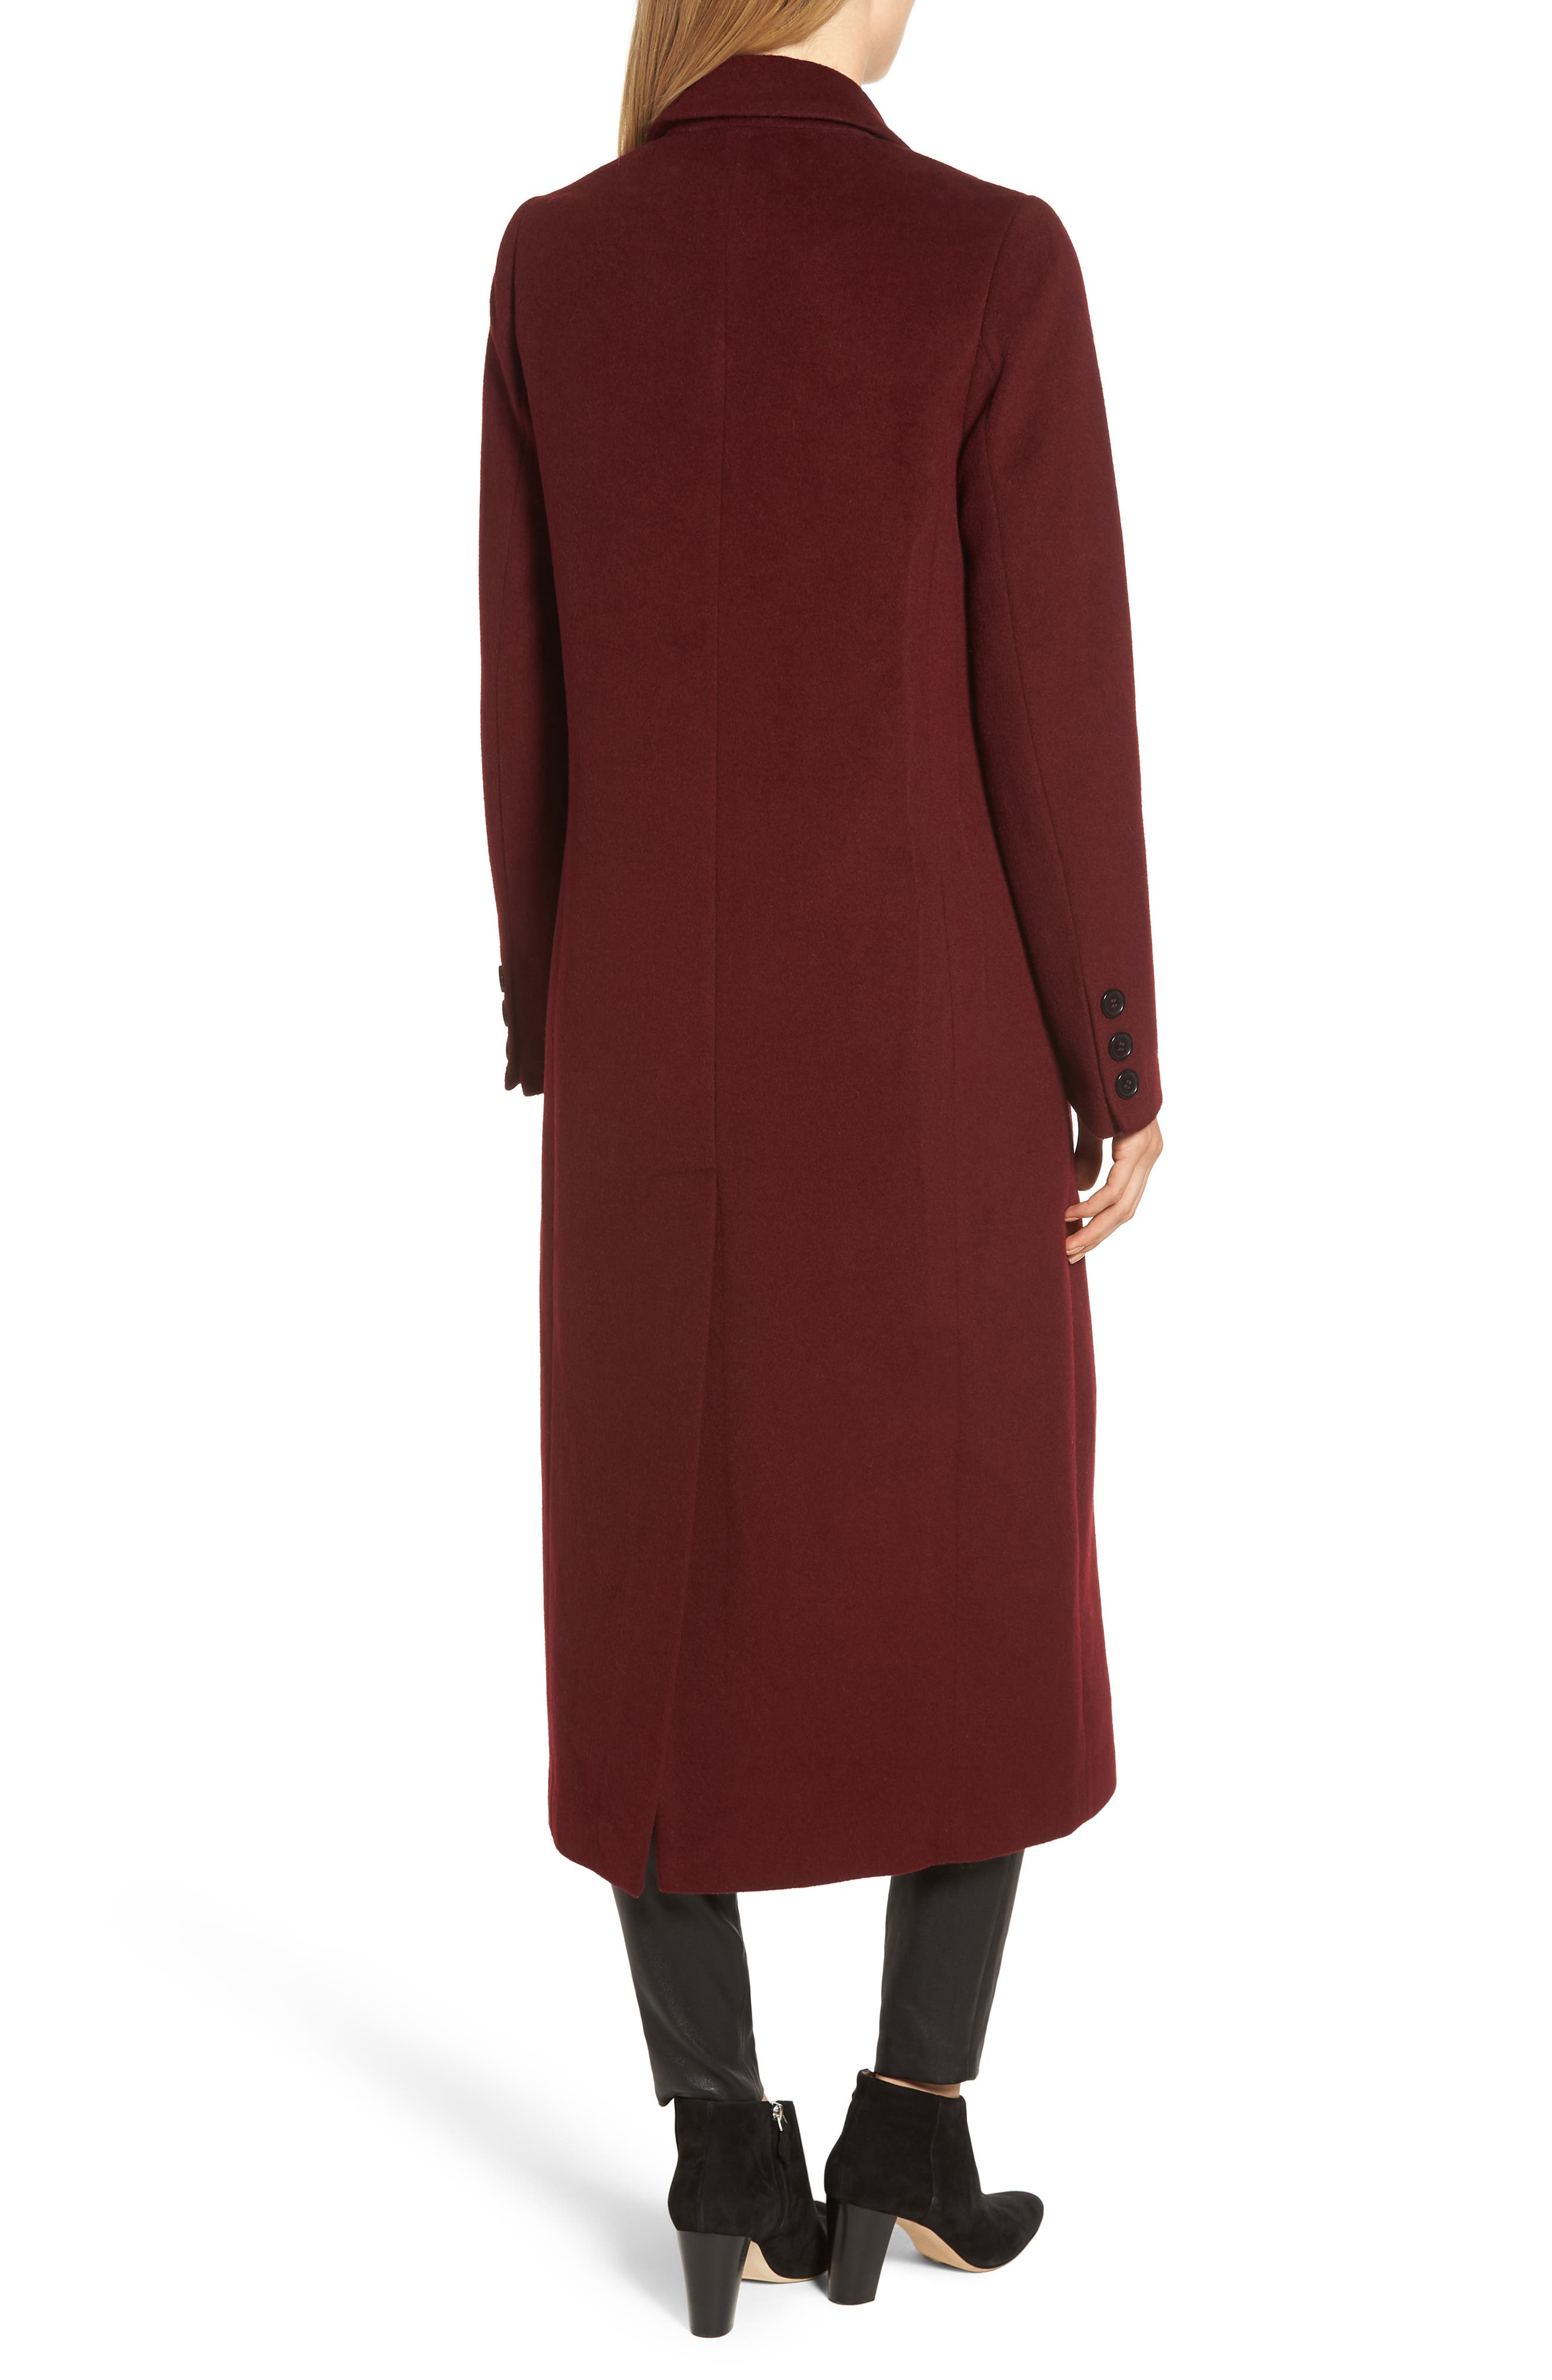 Wool Blend Menswear Coat,                             Alternate thumbnail 2, color,                             BURGUNDY